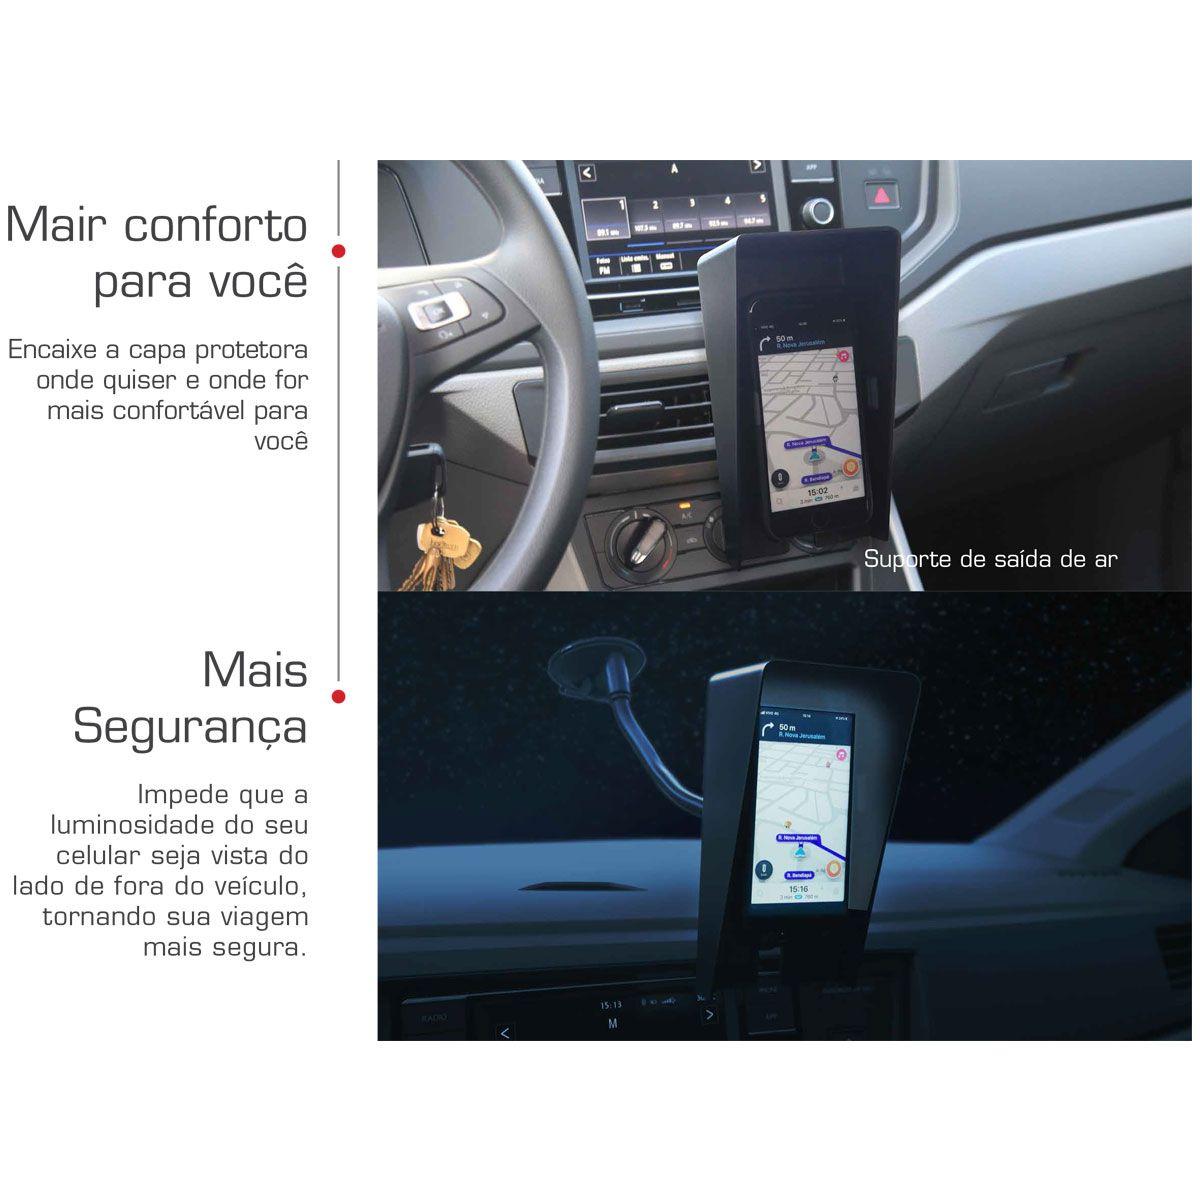 Capa Protetora Suporte Celular Gabinete Alojamento Automotiv